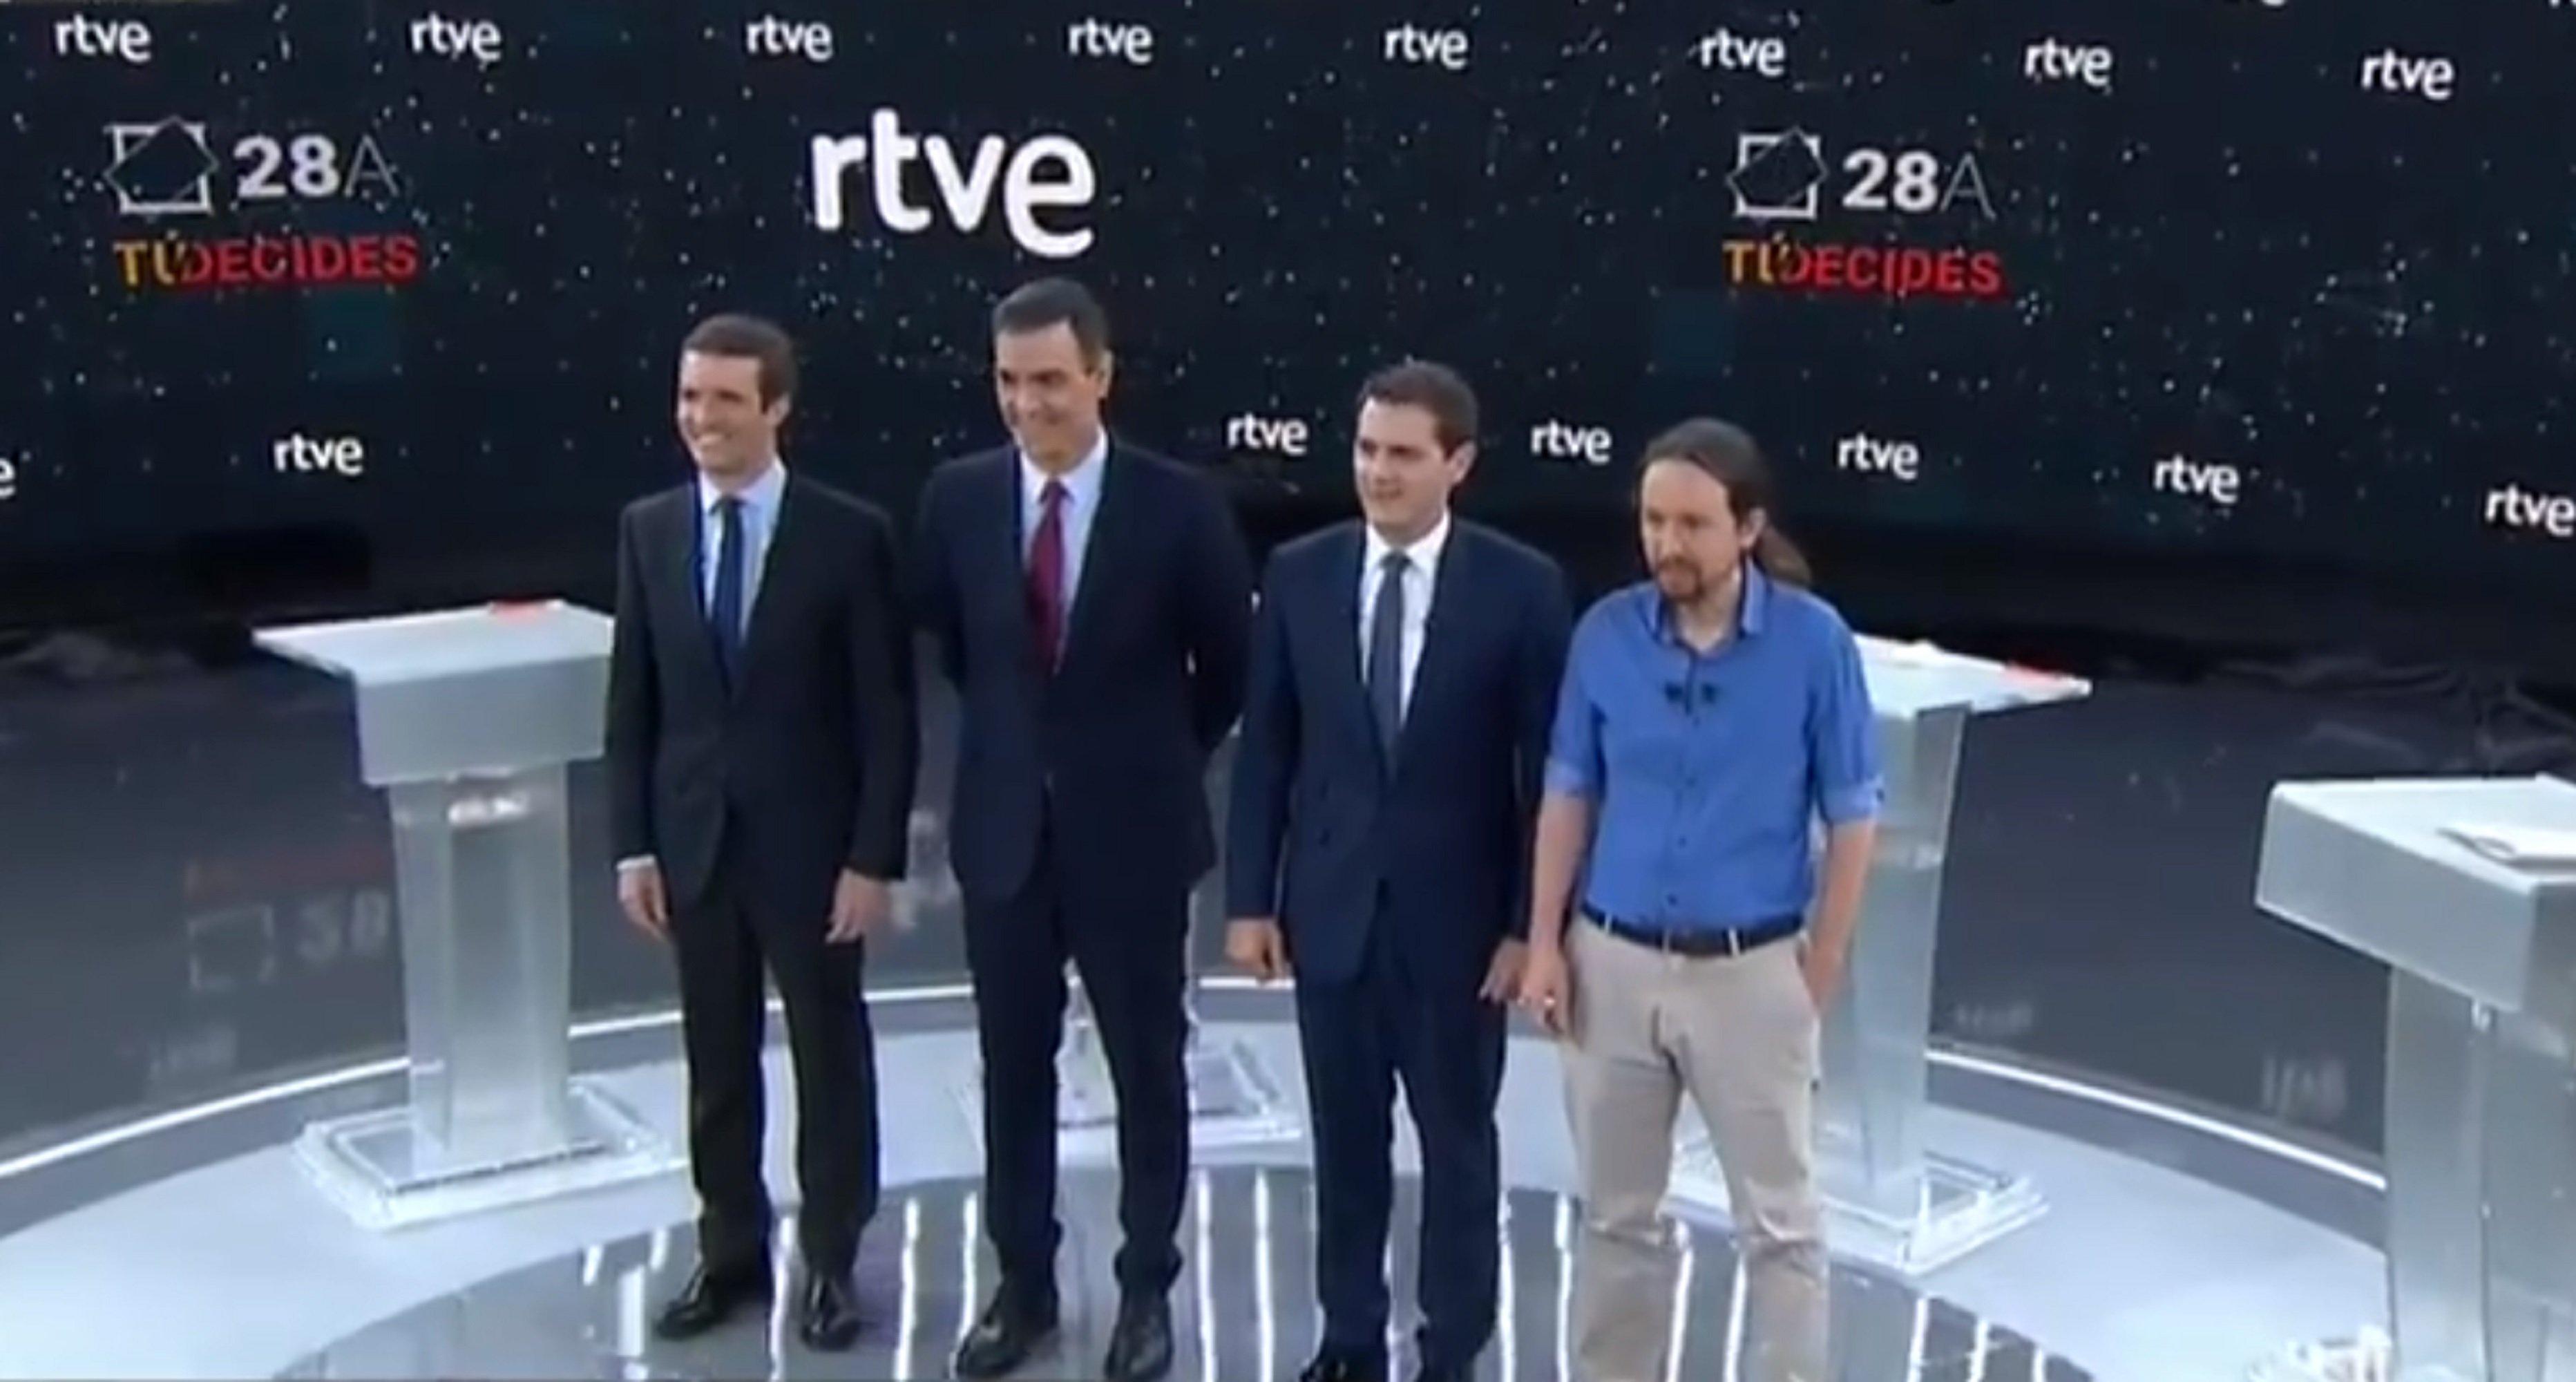 Foto candidats debat RTVE